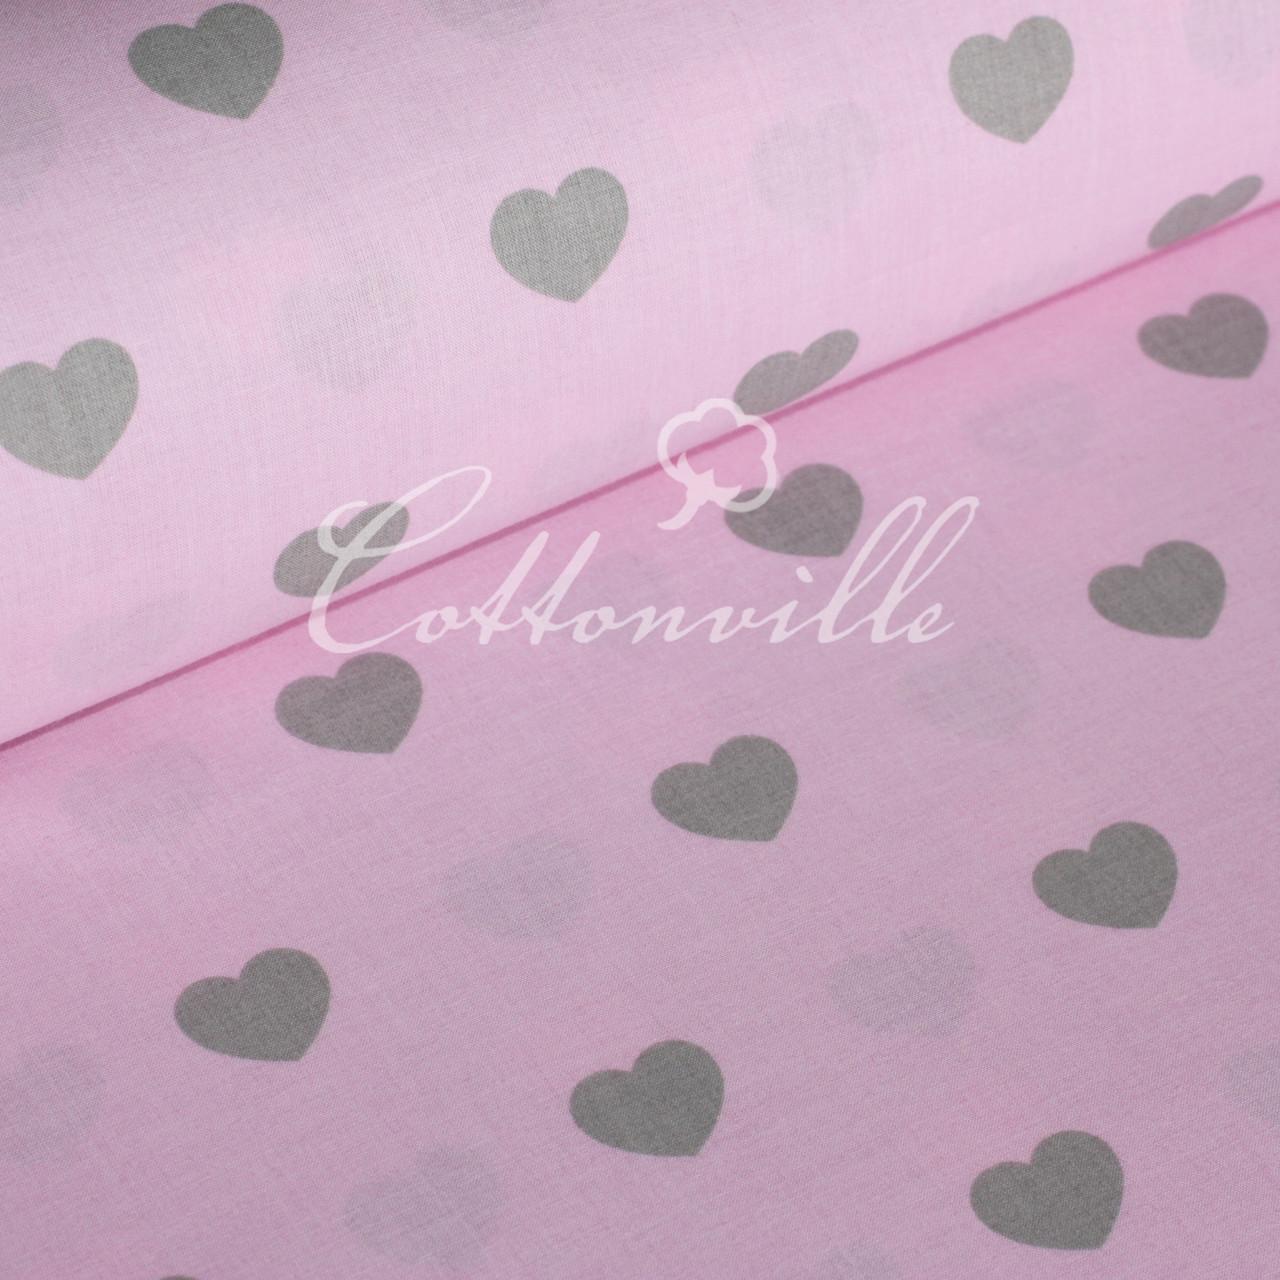 Бязь Сердечки серые на розовом (30 мм)